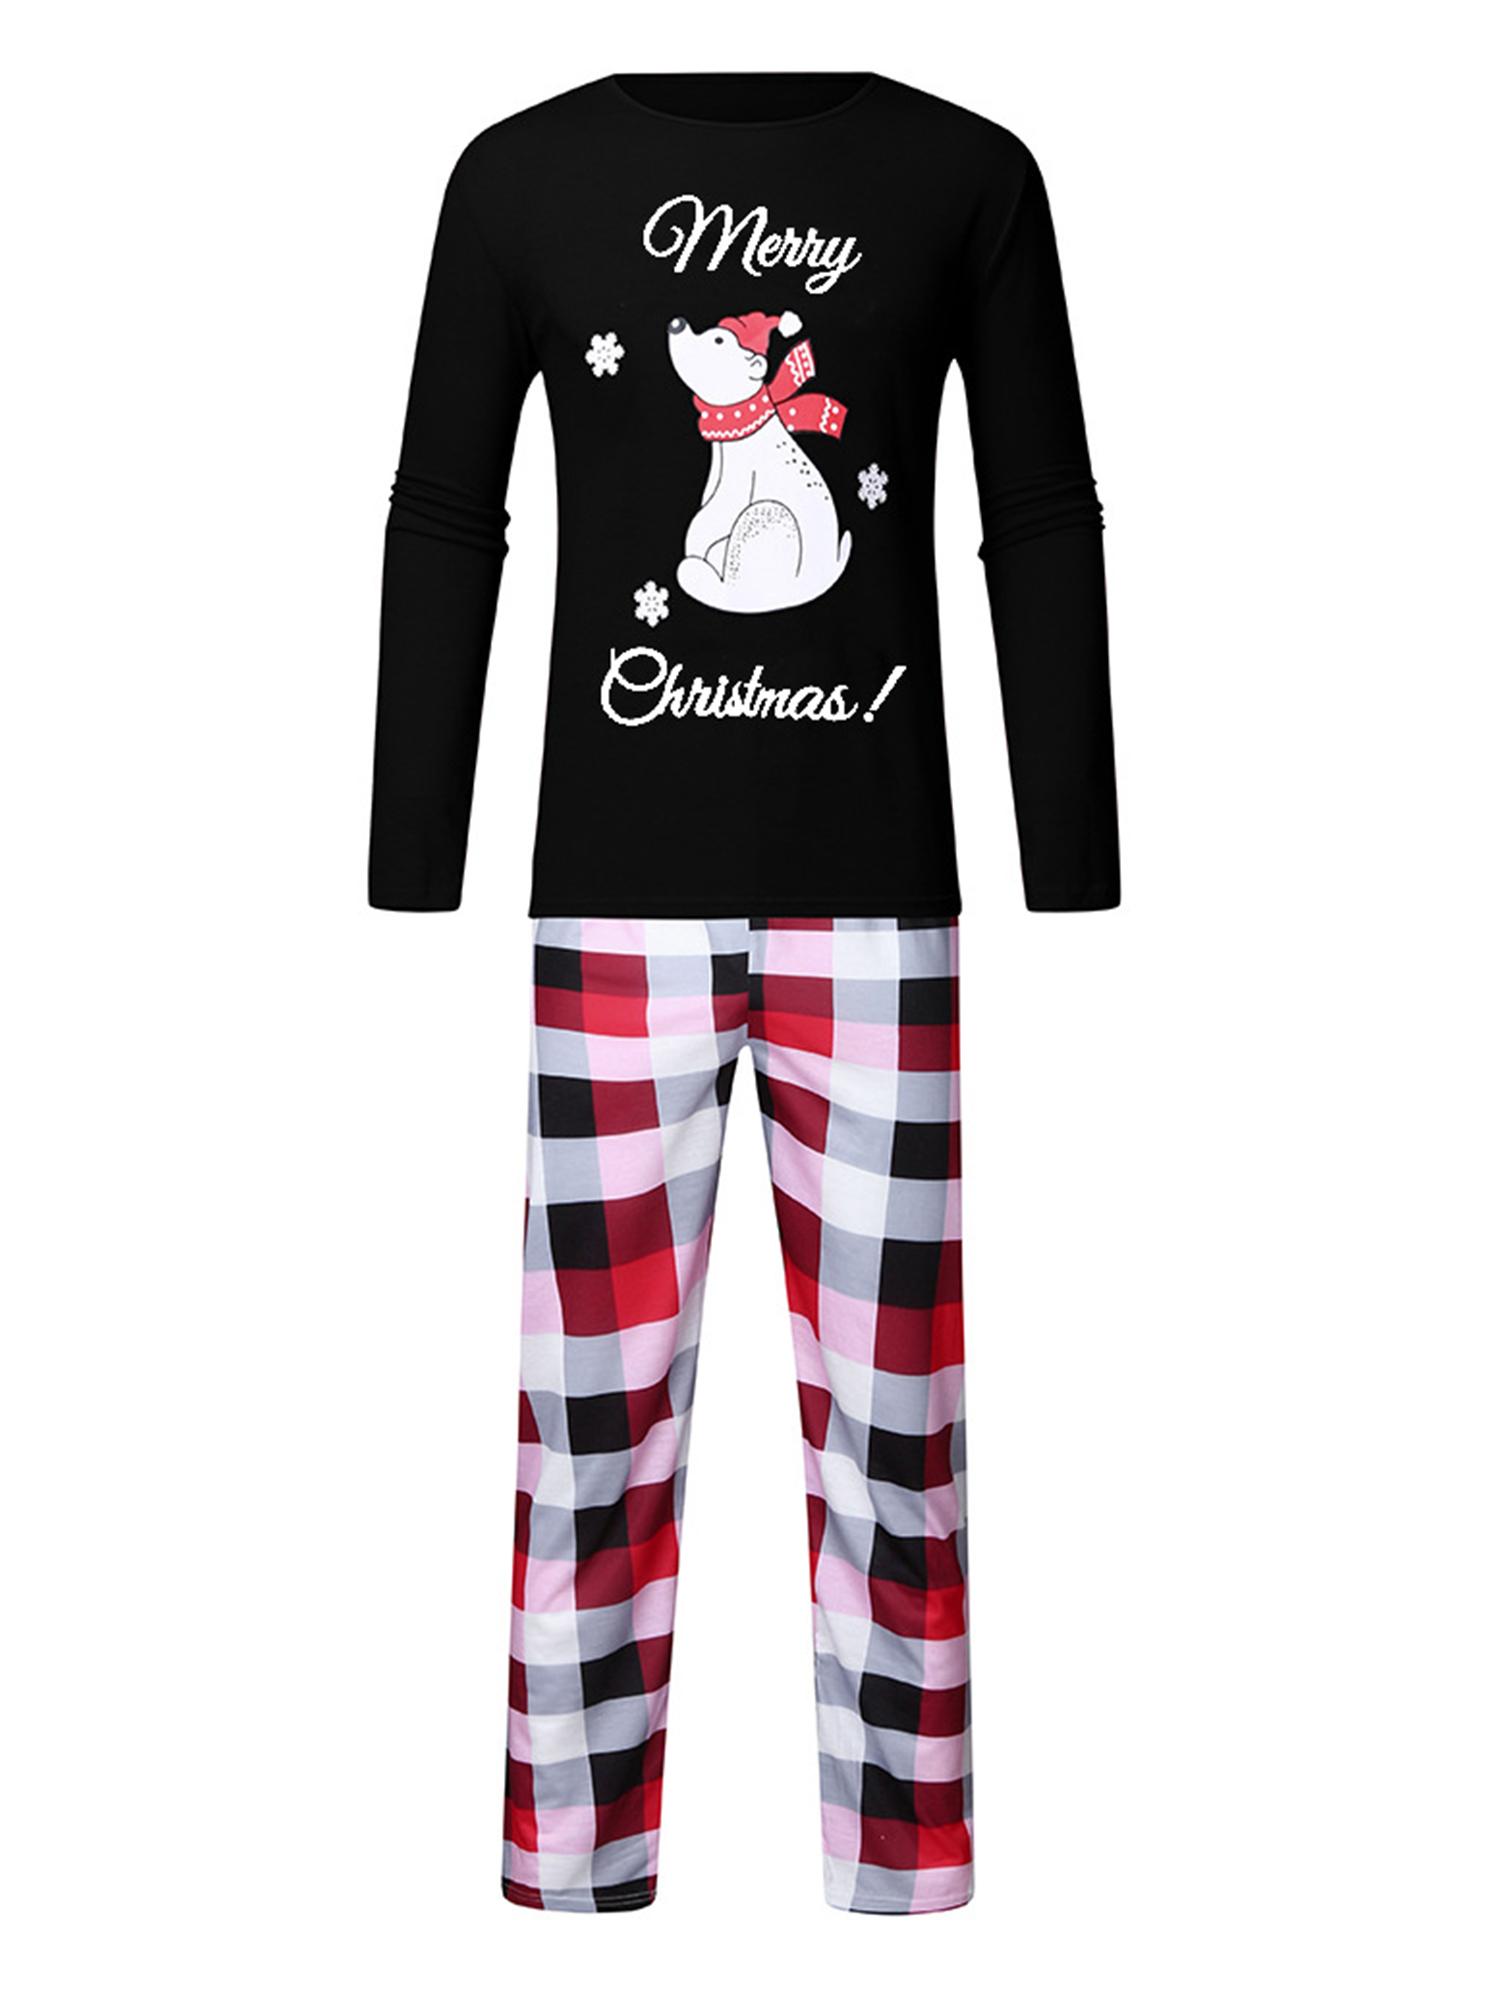 Chennie Family Matching Clothes Women Men Kid Baby Battery Print Nightwear Pajamas Set